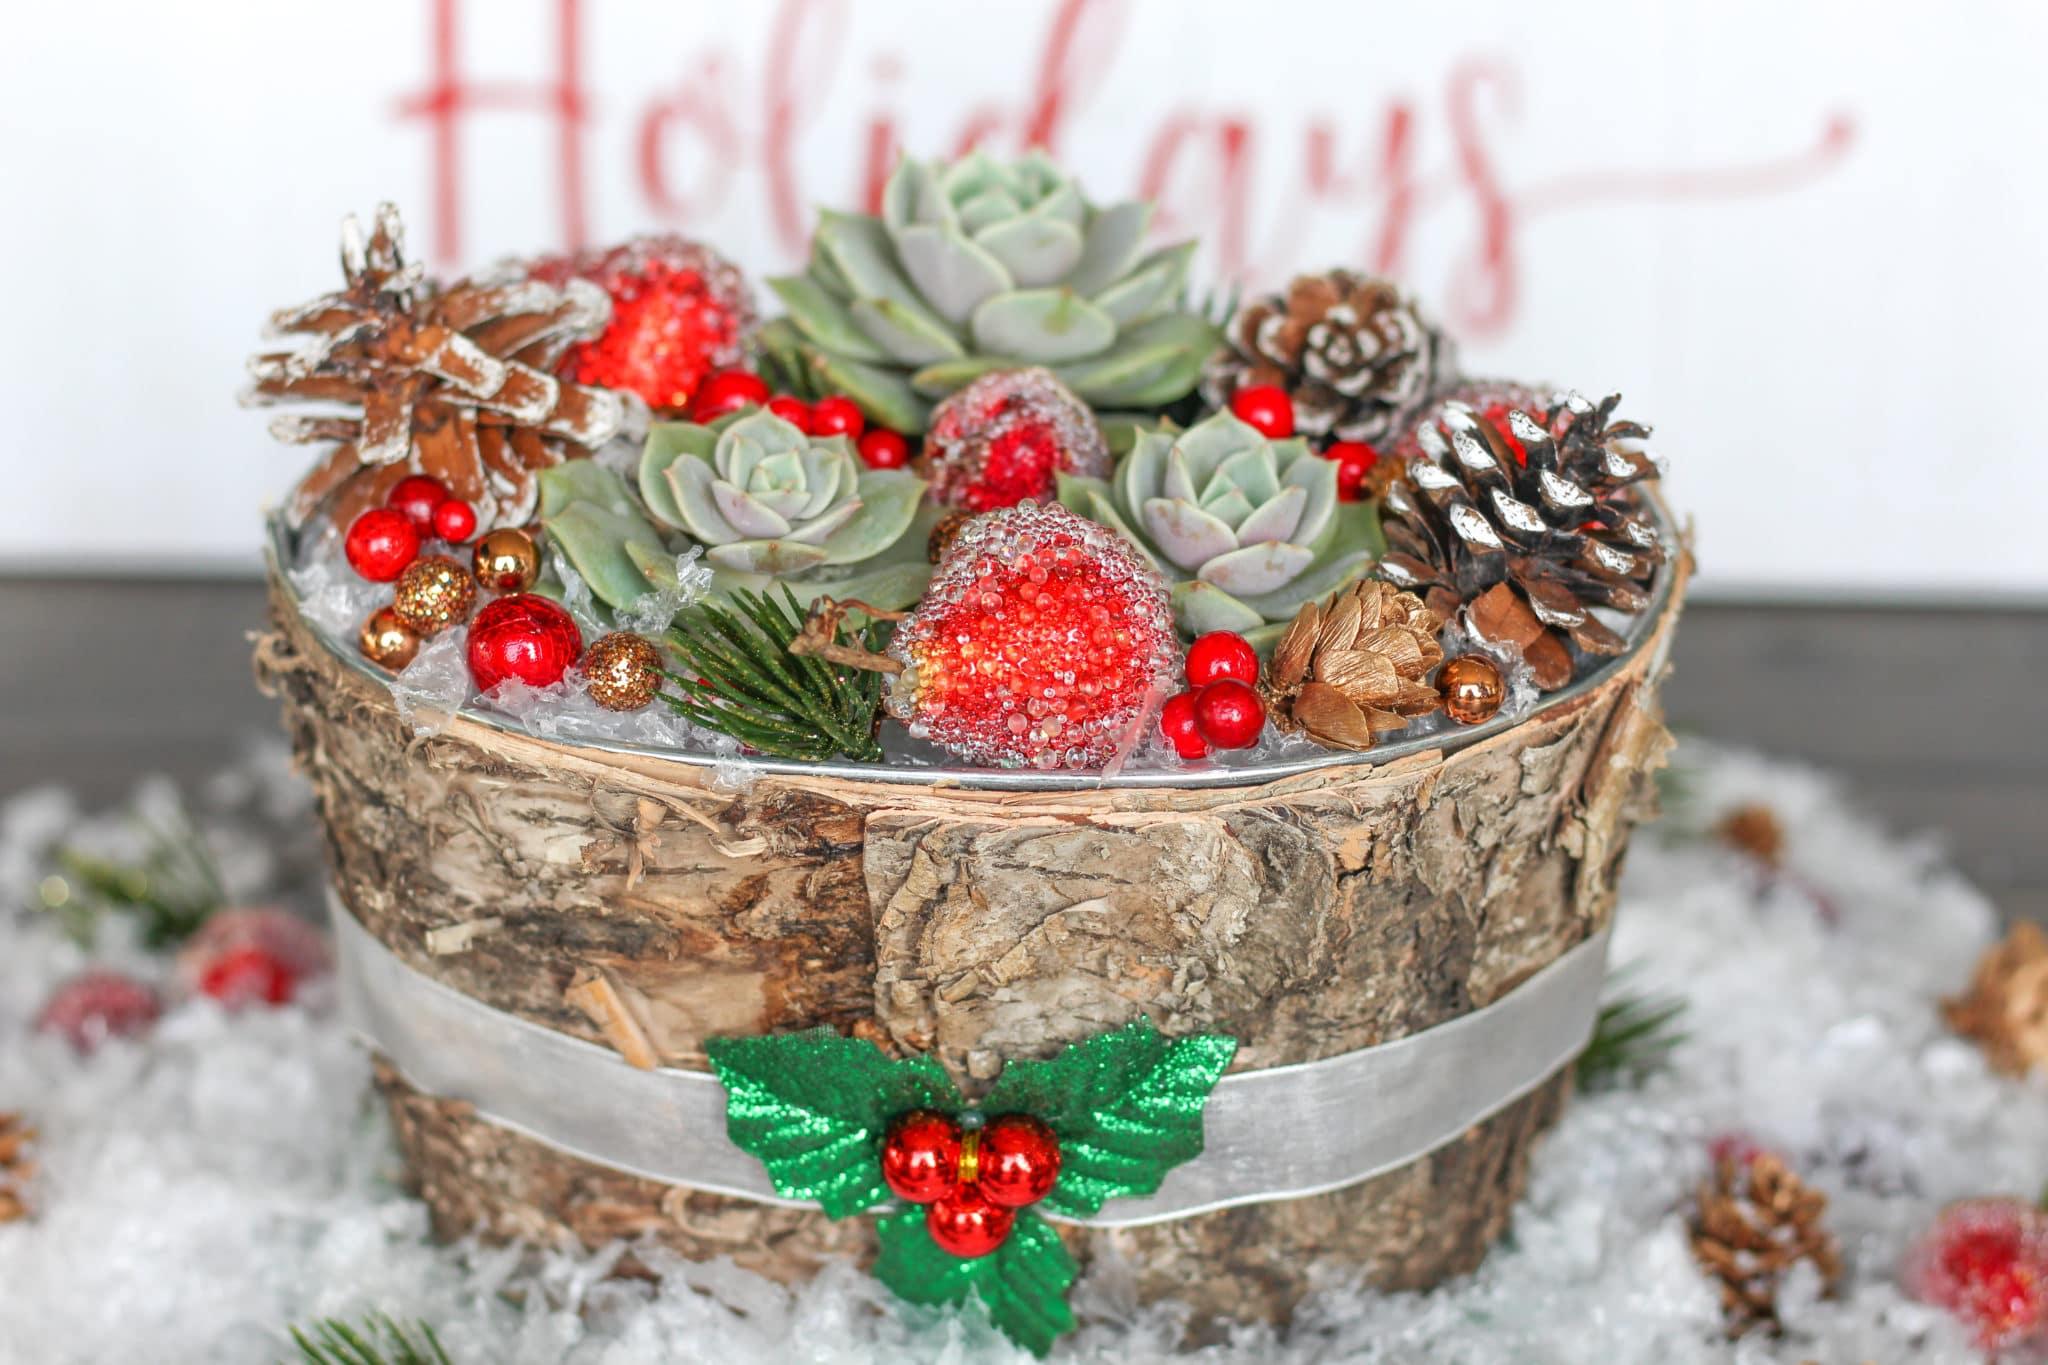 Christmas Succulent Decor.A Beautiful Diy Succulent Centerpiece For Your Christmas